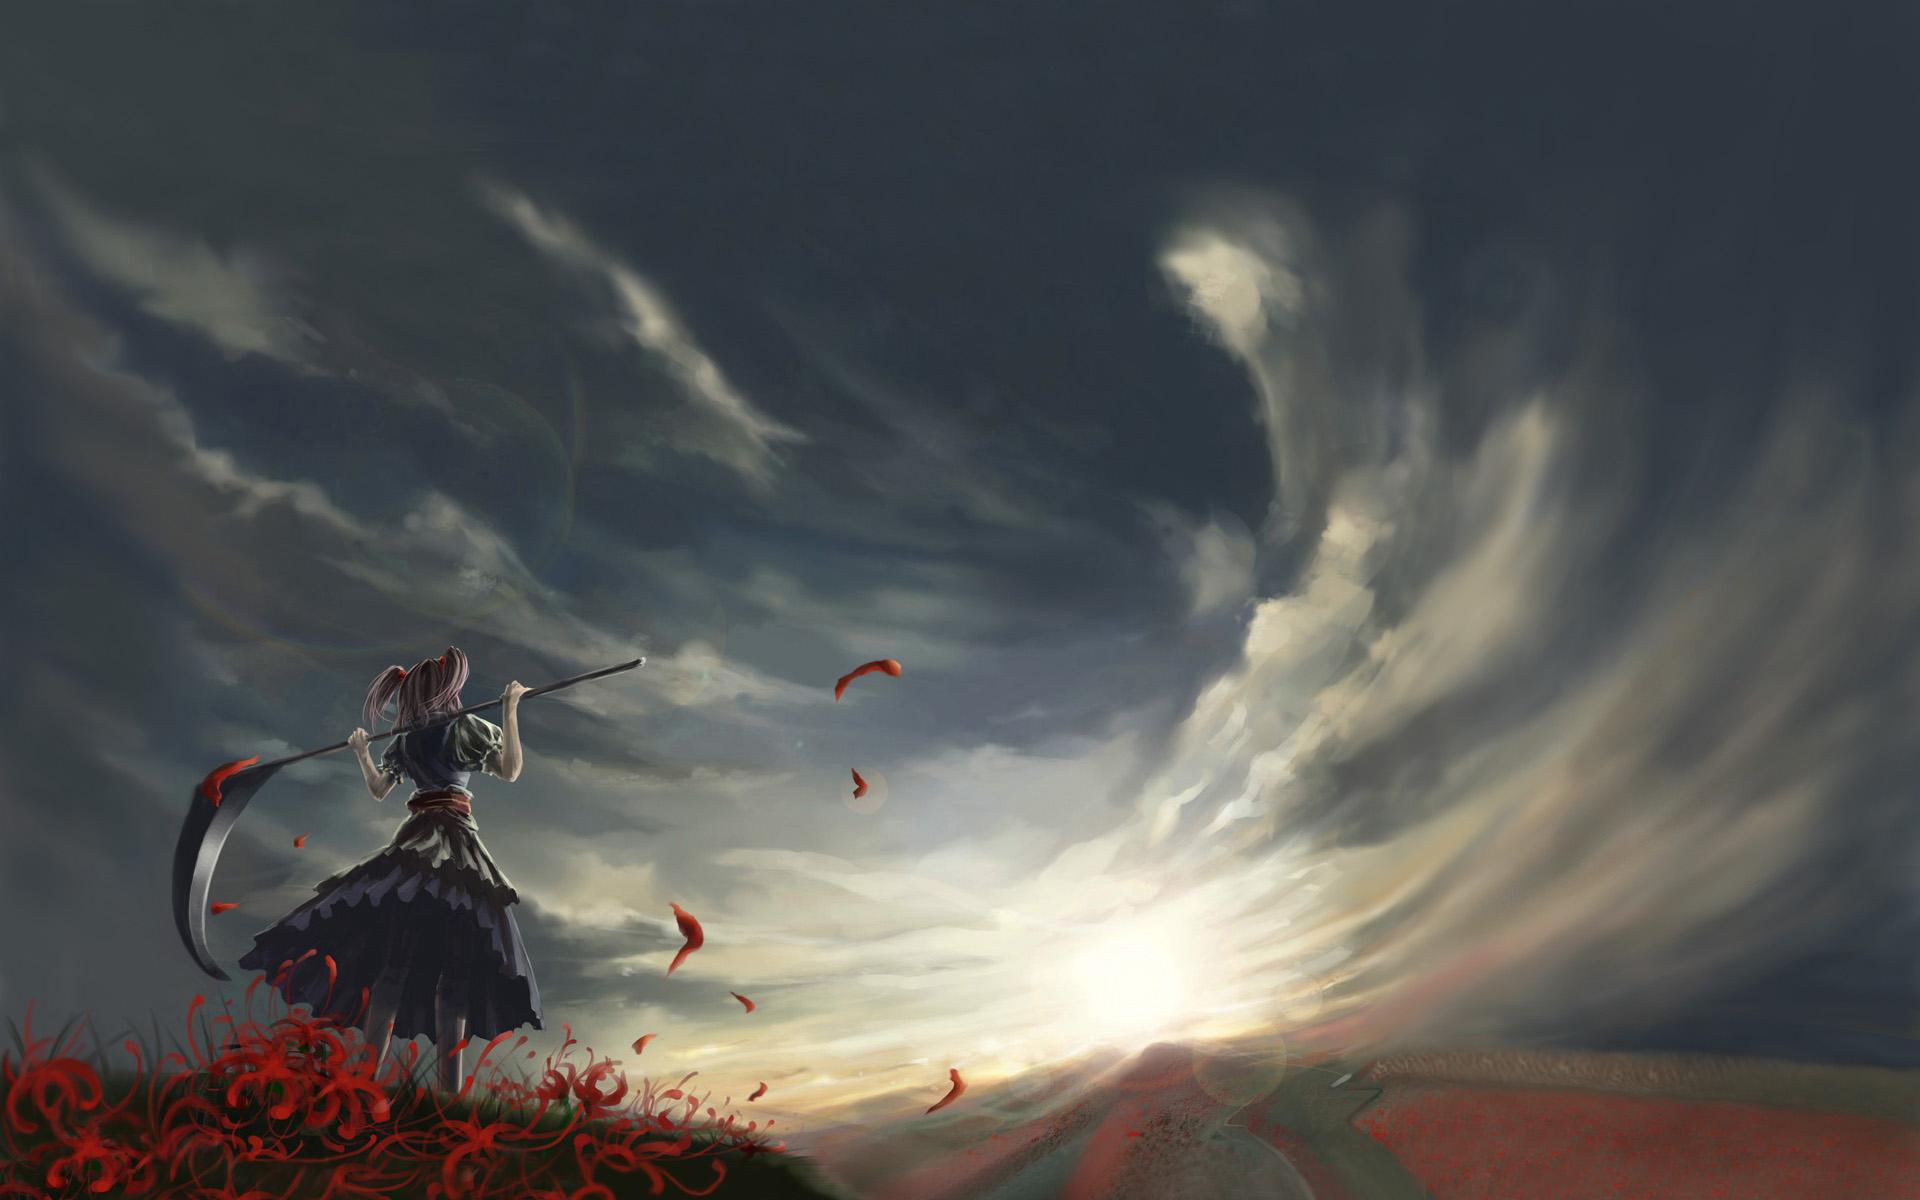 kong_xian onozuka_komachi photoshop scythe sky touhou weapon